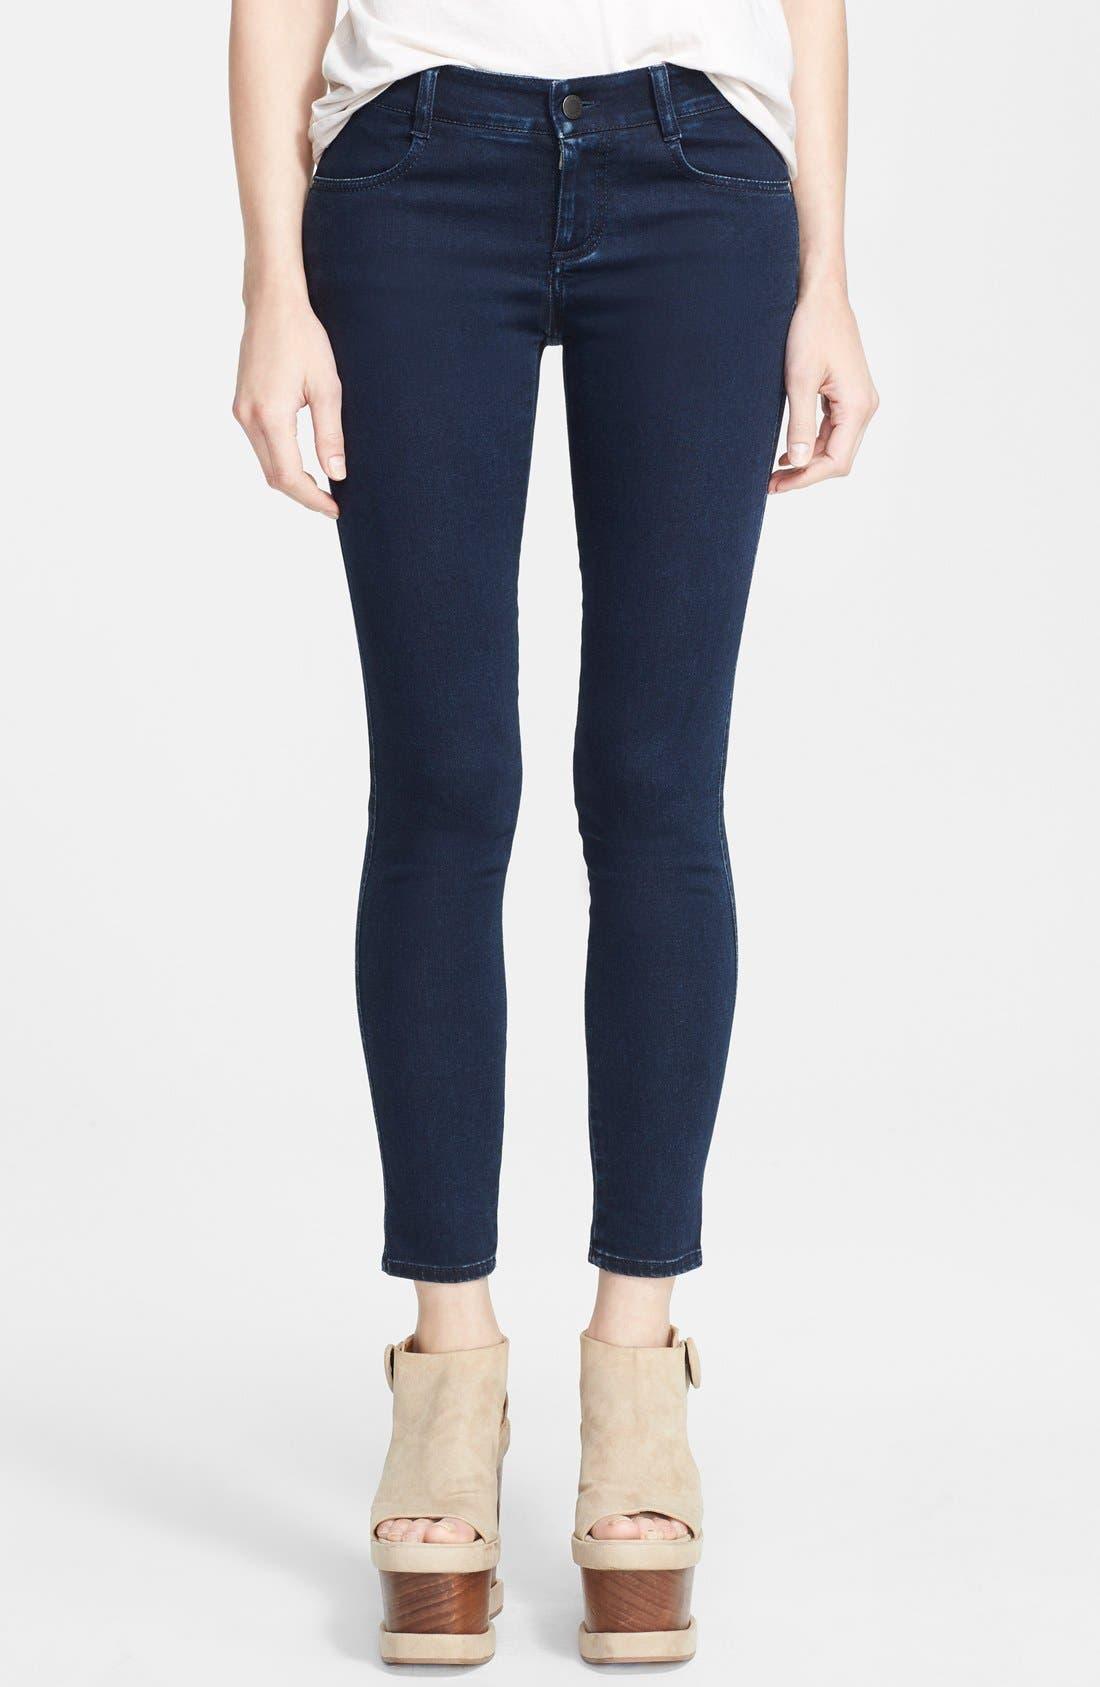 Alternate Image 1 Selected - Stella McCartney Skinny Ankle Grazer Jeans